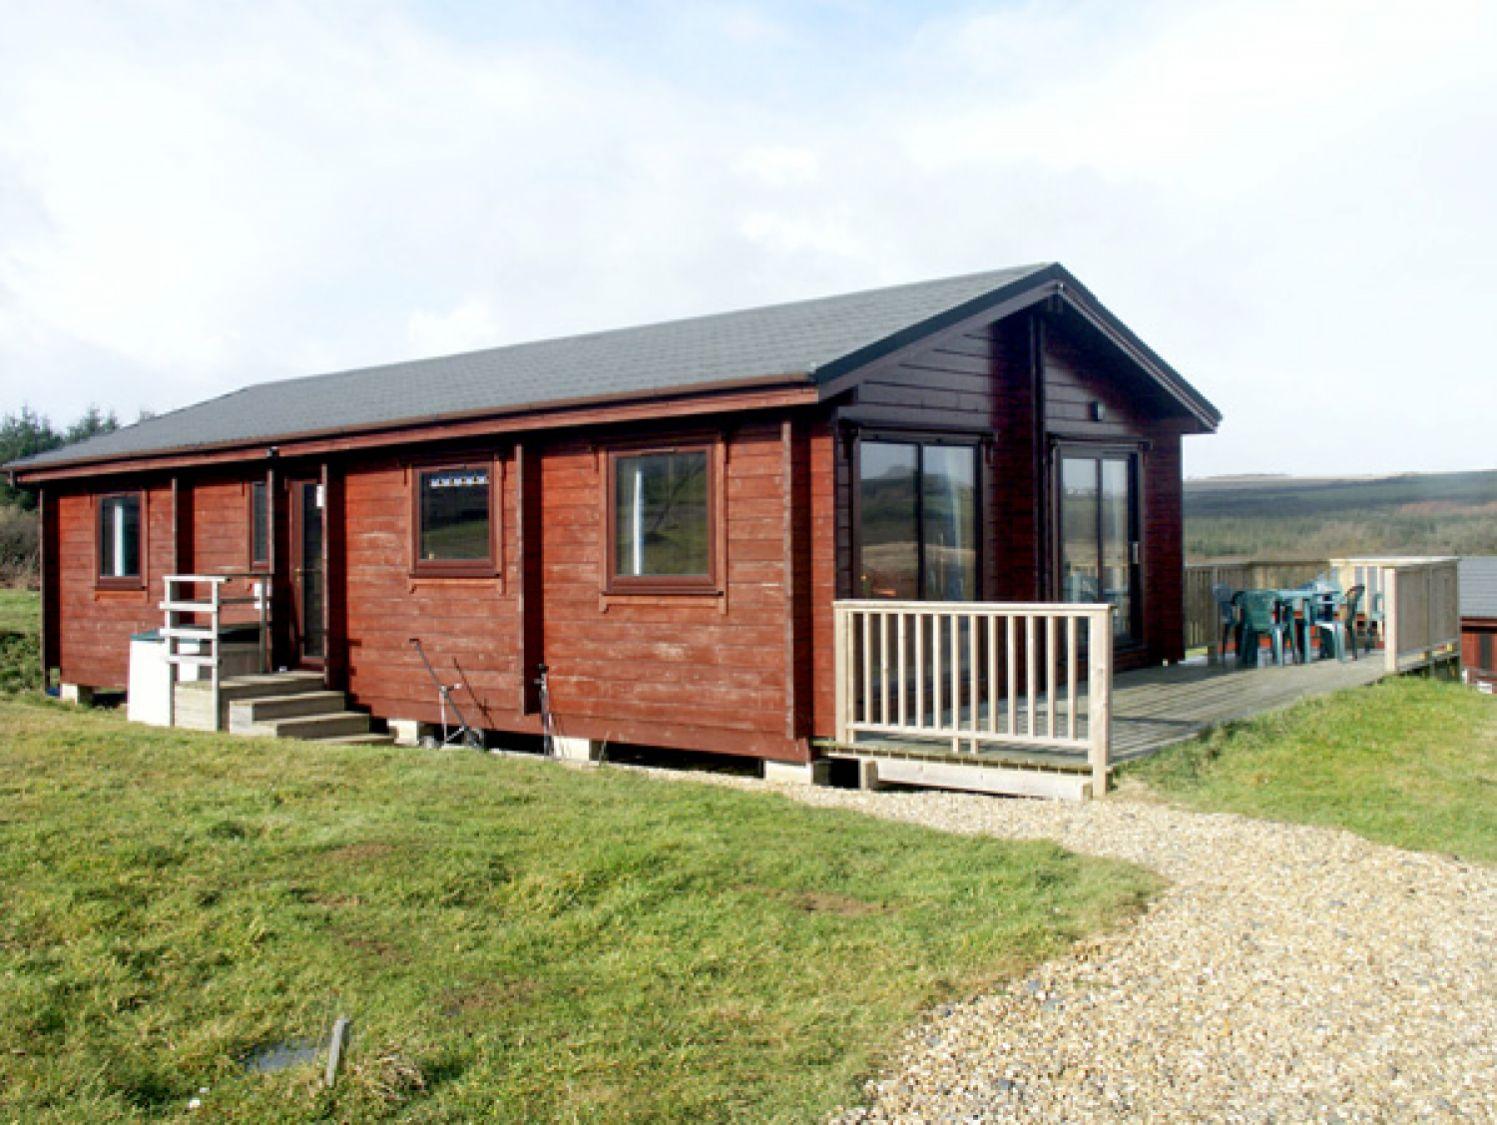 Hartland Lodge 59, Bideford,Devon,England